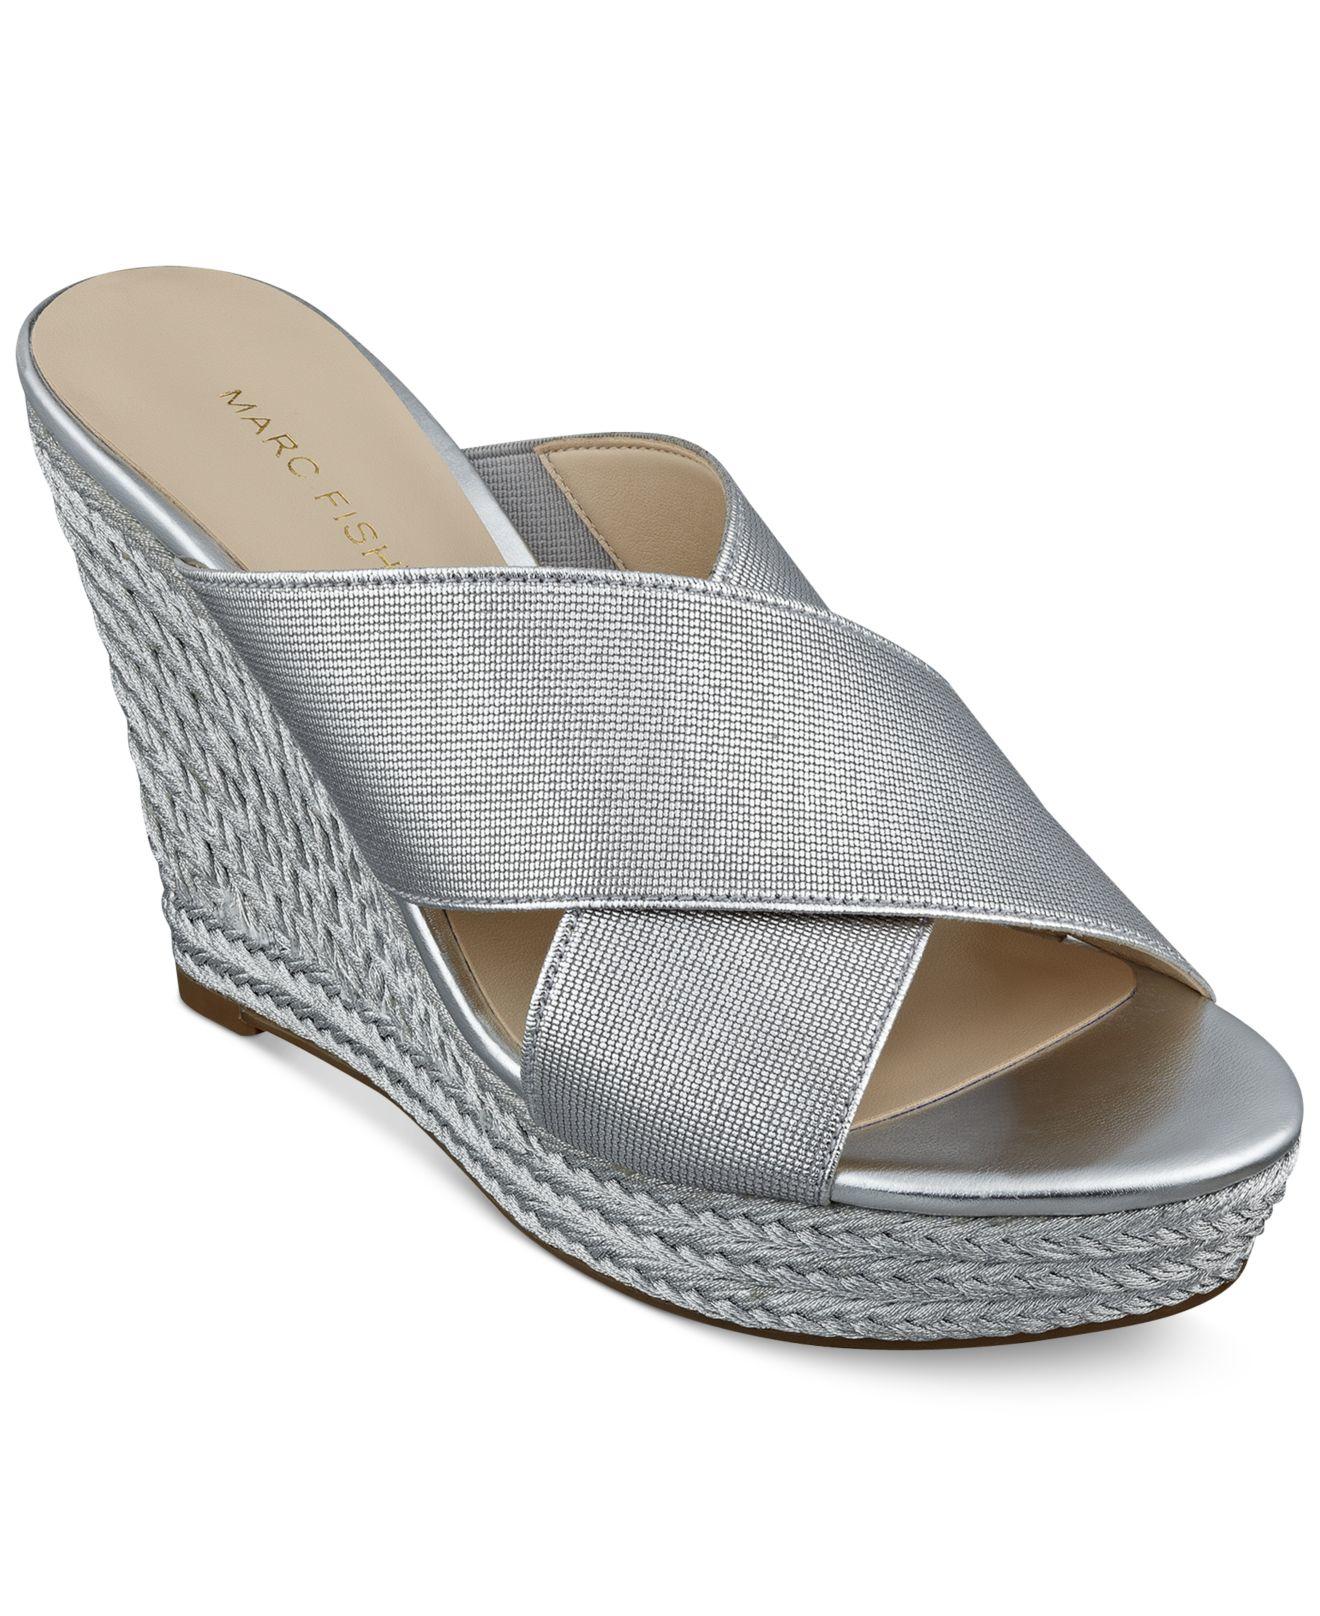 3121c4778ea Marc Fisher Metallic Engage Slide Platform Wedge Sandals